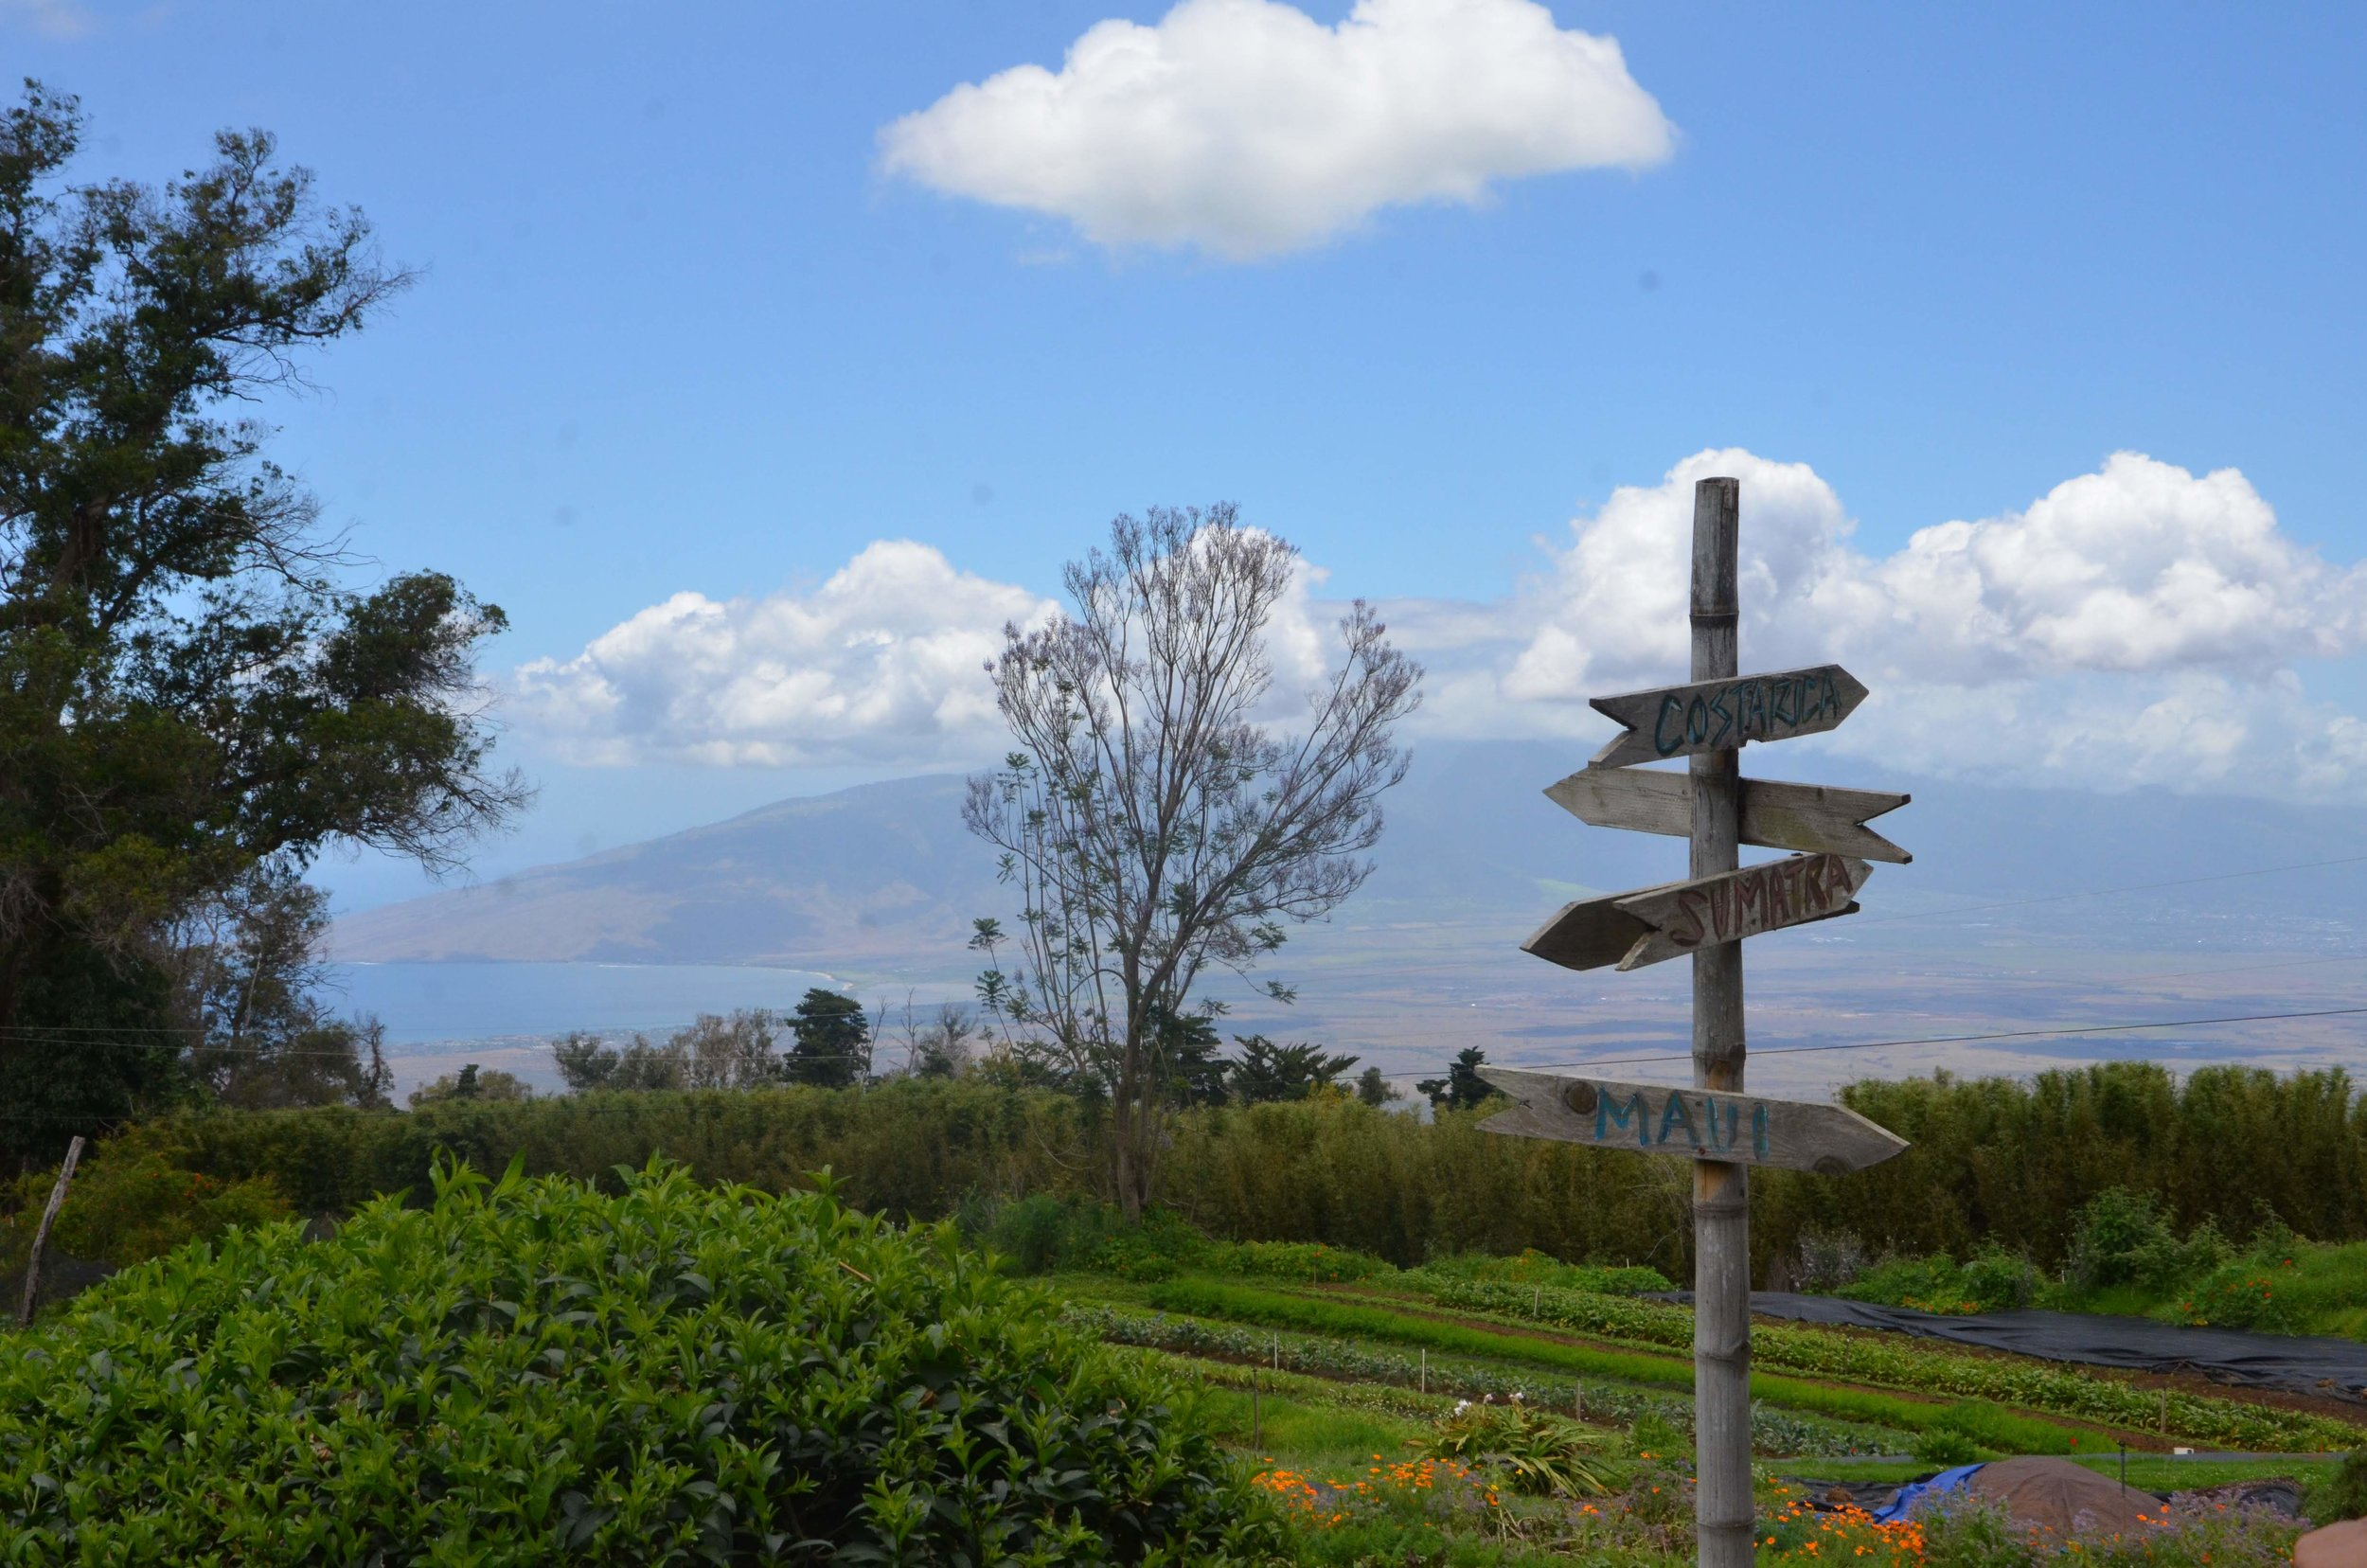 Oo Farm Upcountry Maui